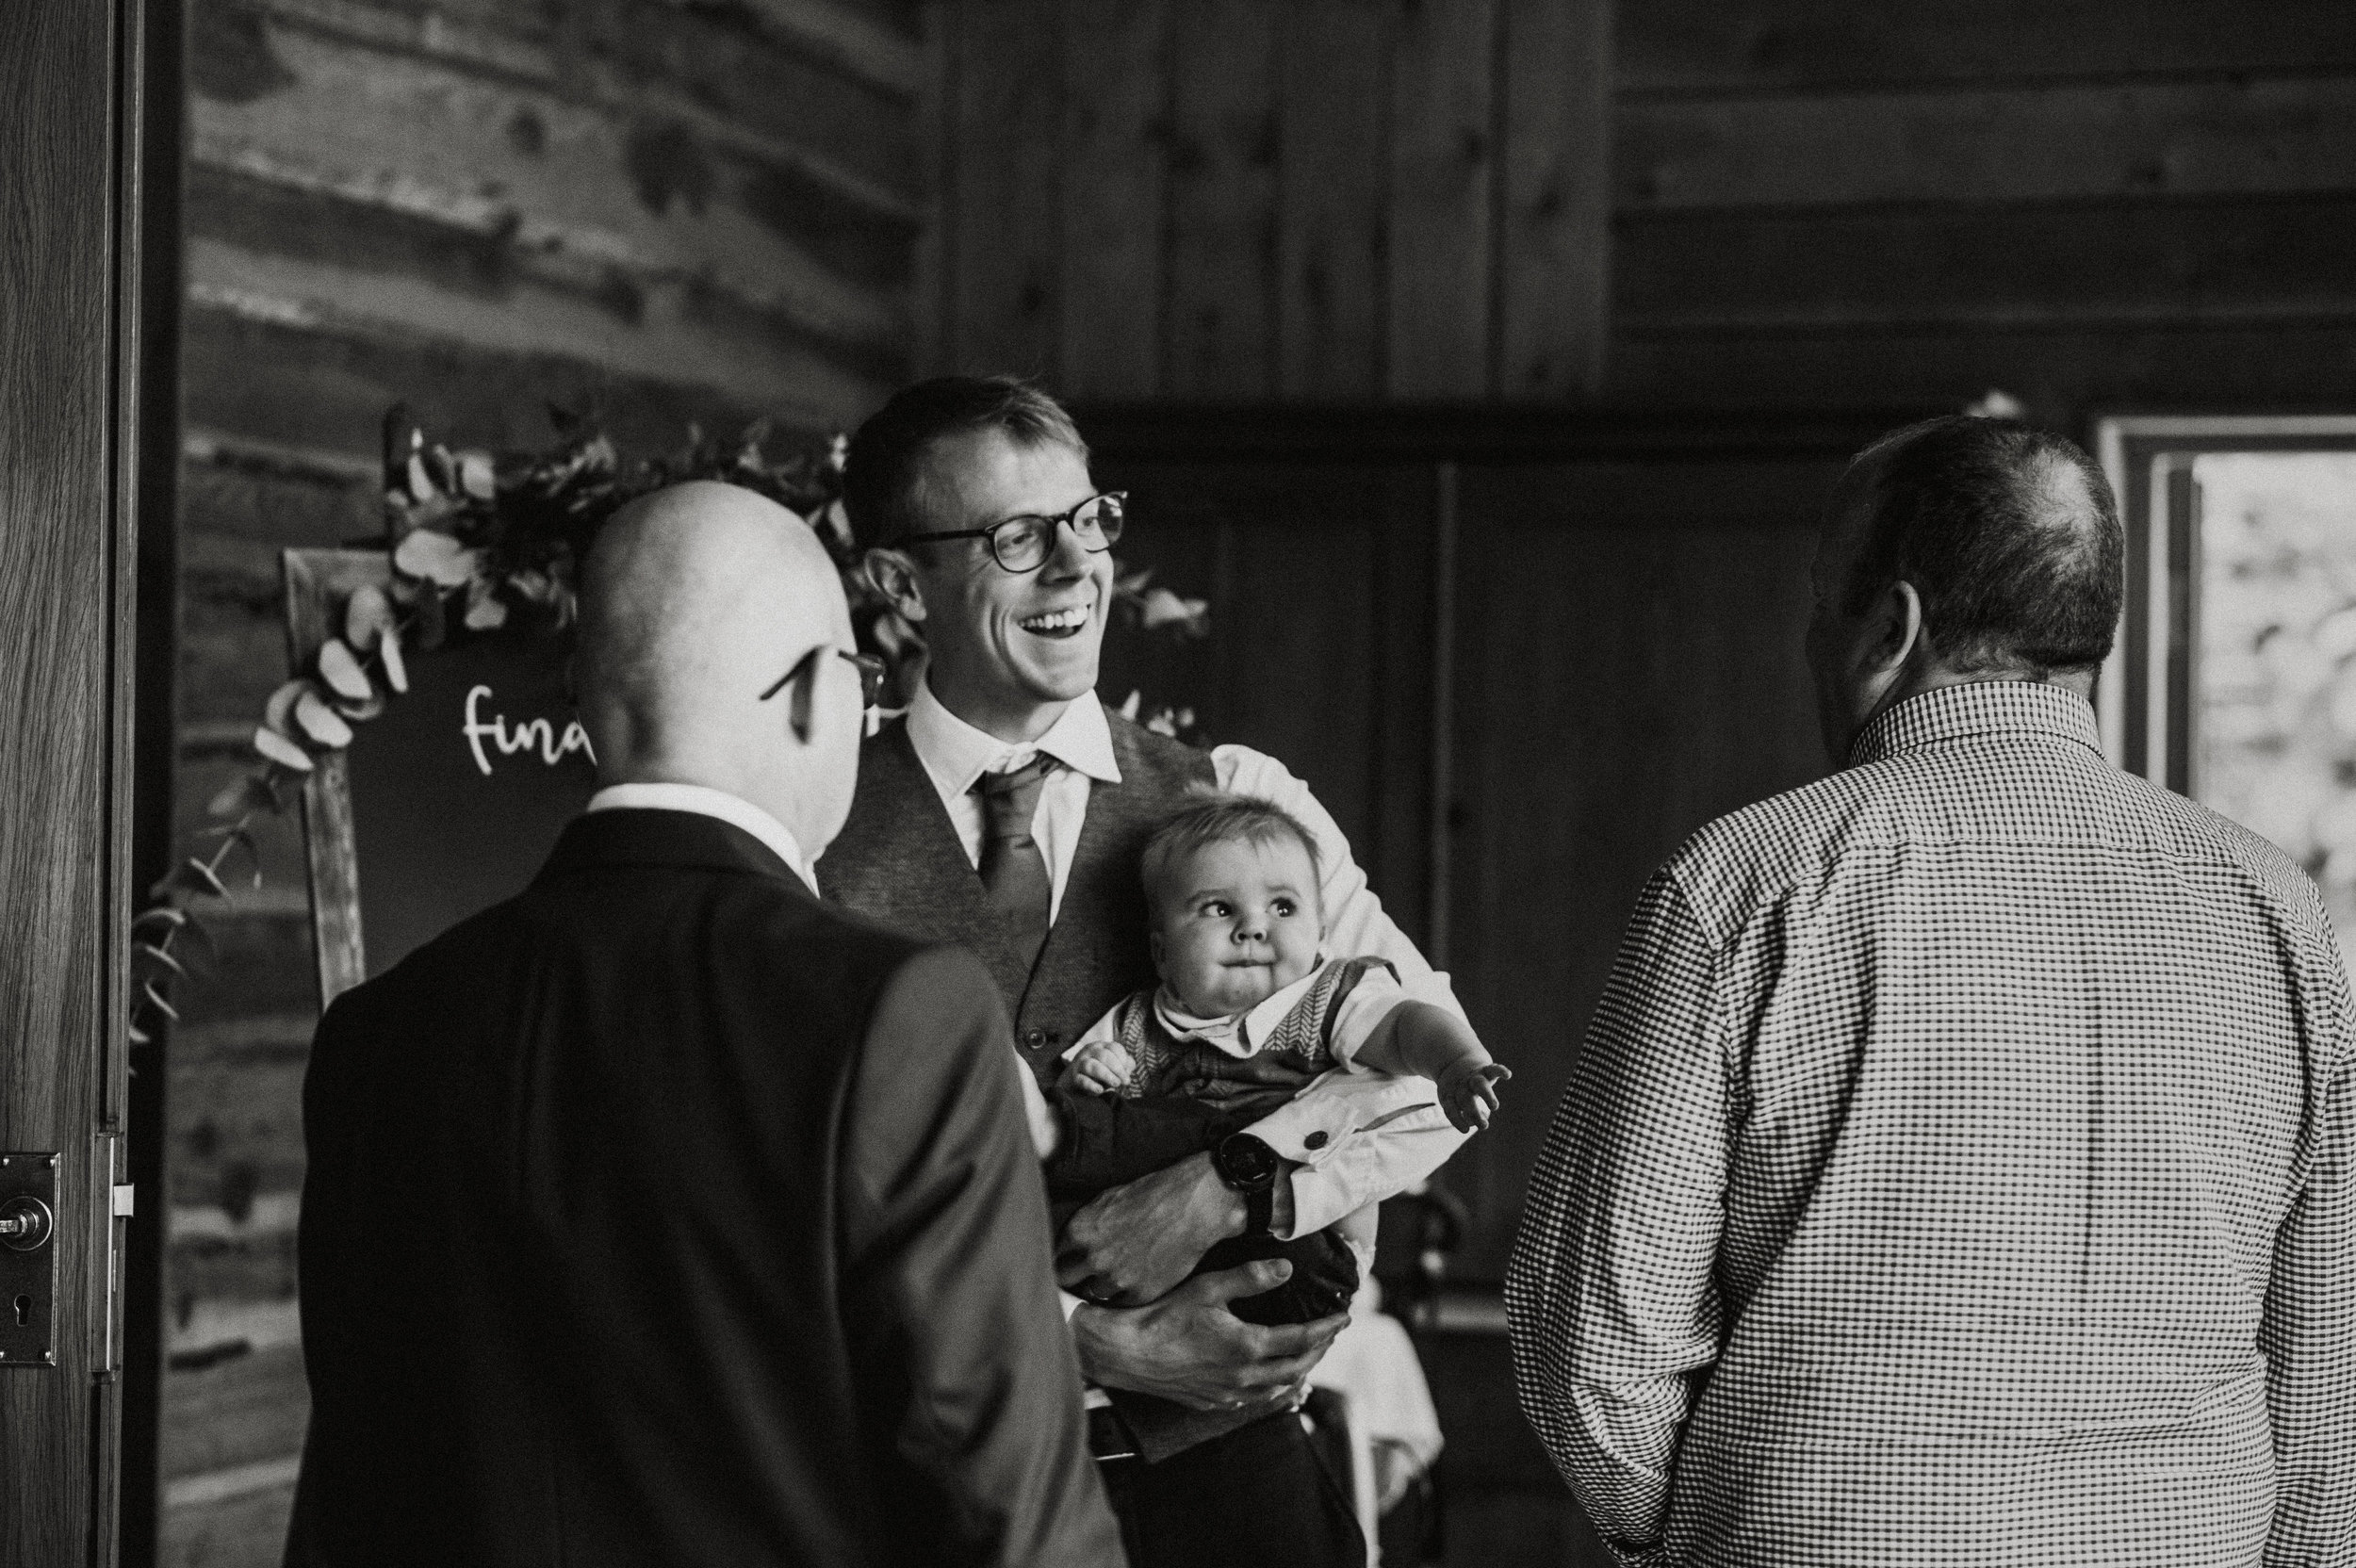 nancarrow-farm-wedding-photographer-cornwall-39.jpg